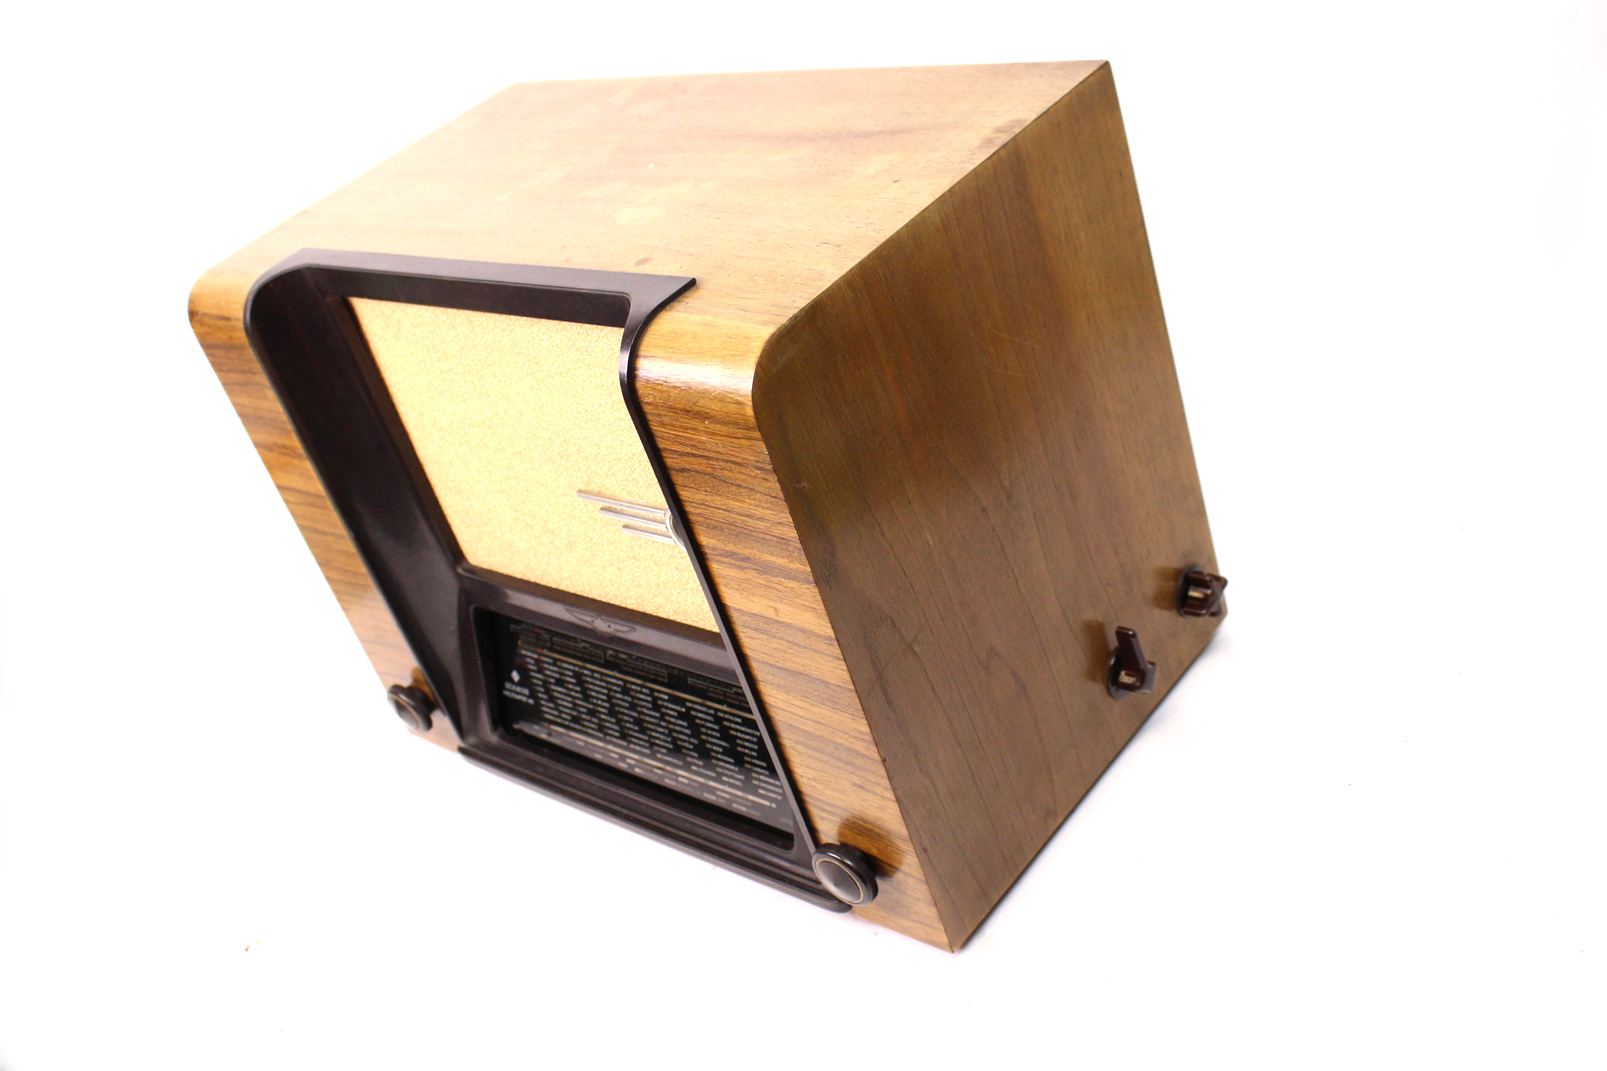 schaub weltsuper 40 luxus r hrenradio vintage. Black Bedroom Furniture Sets. Home Design Ideas